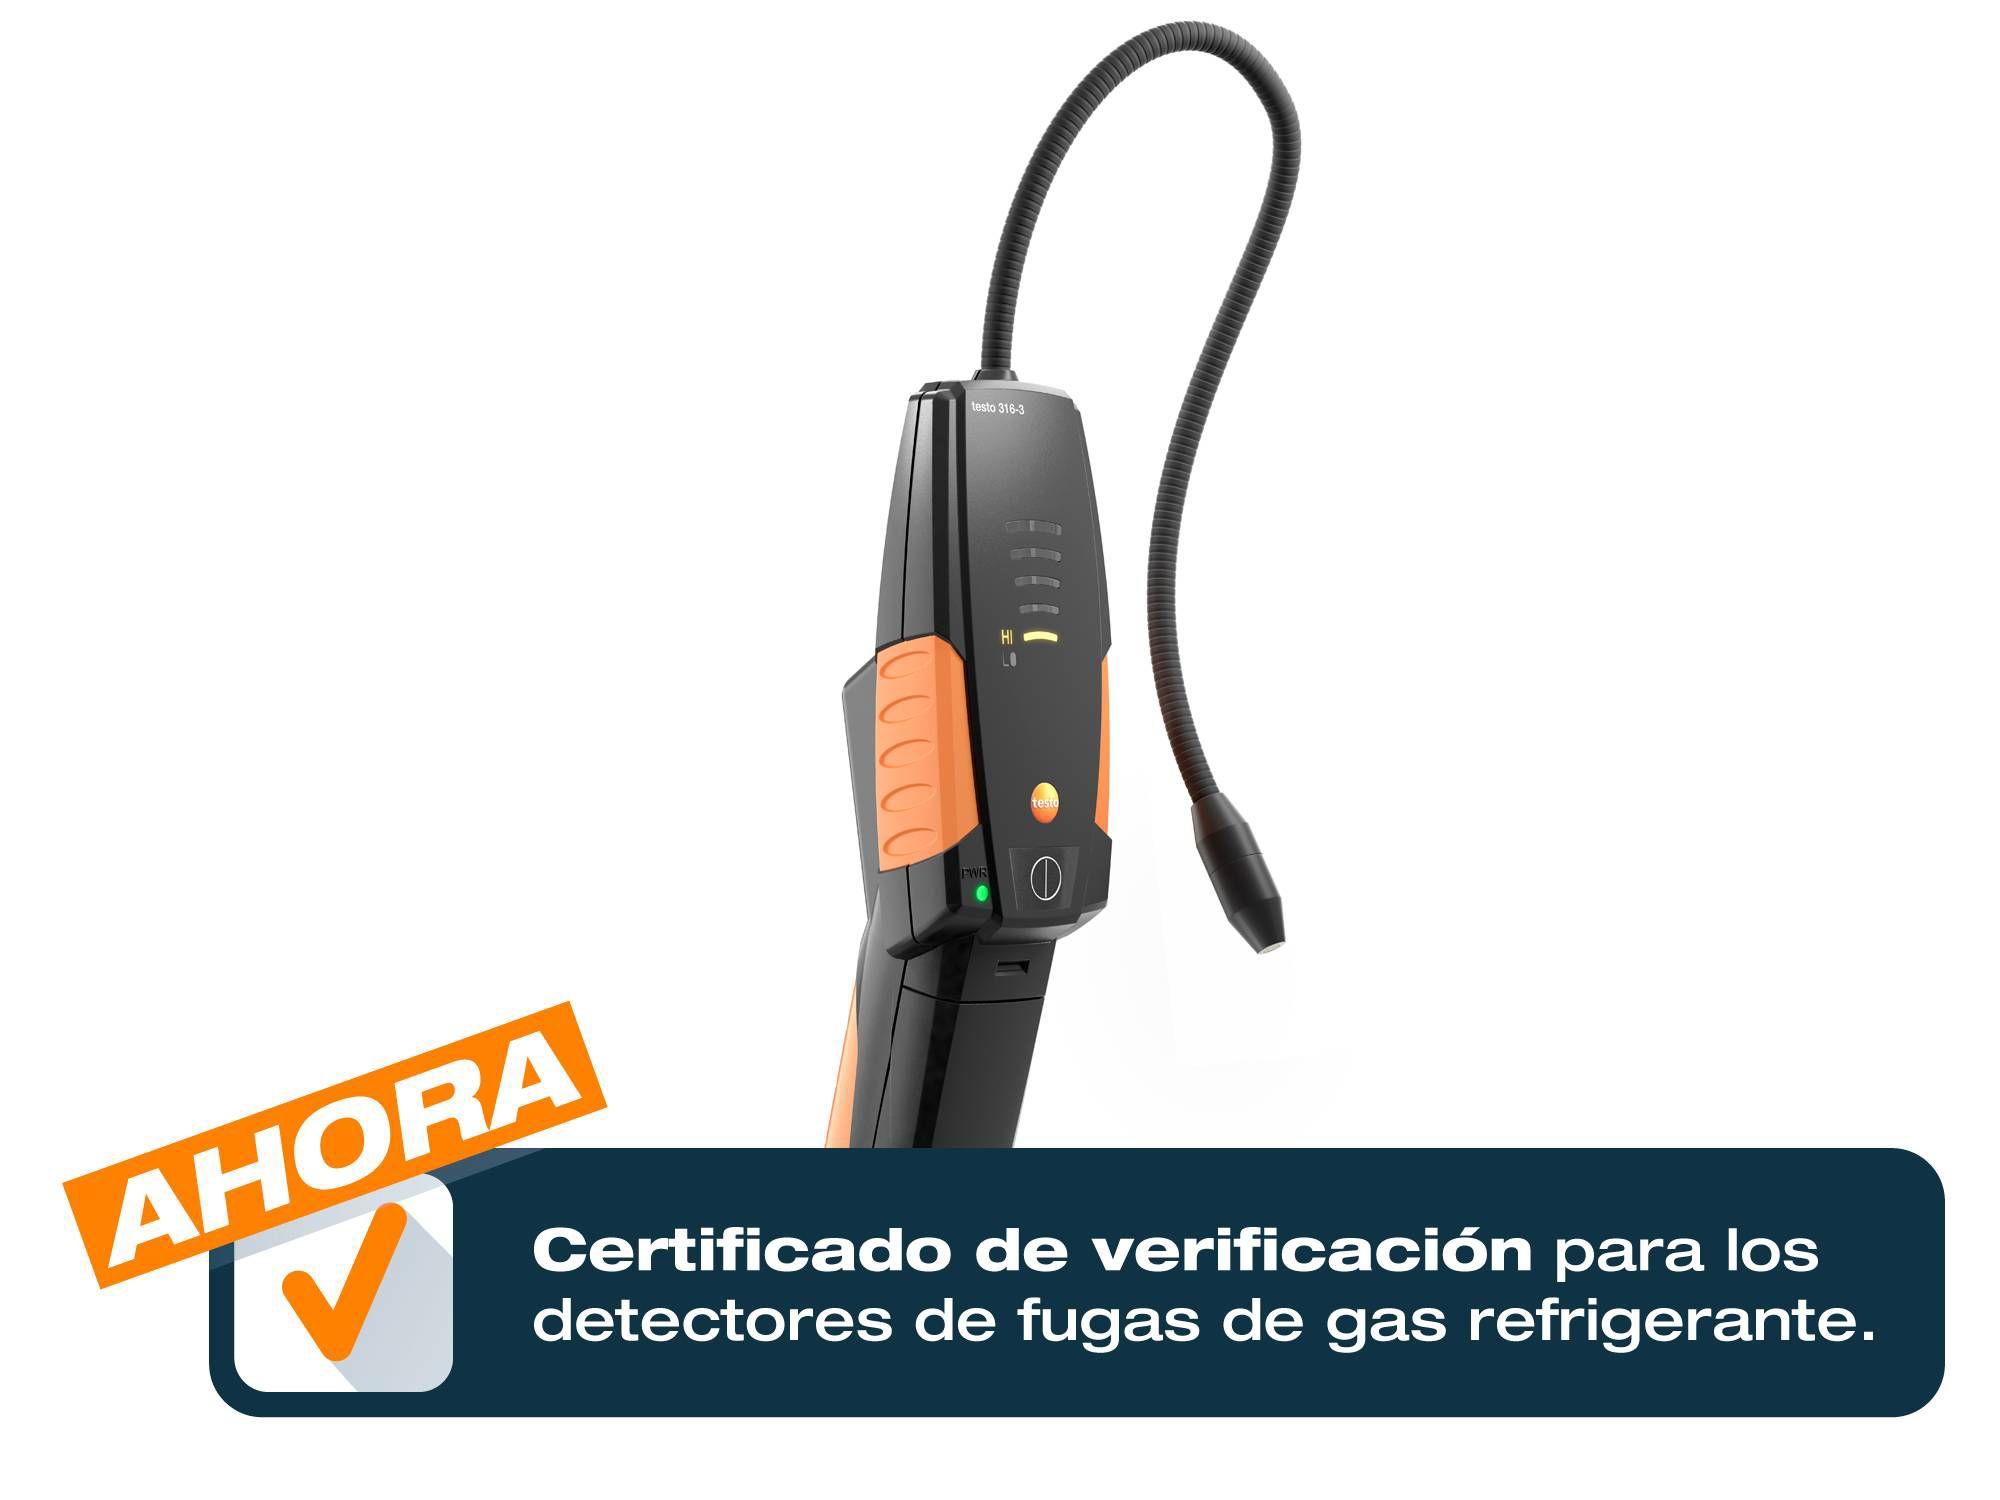 Testo 316-3 con certificado de calibración